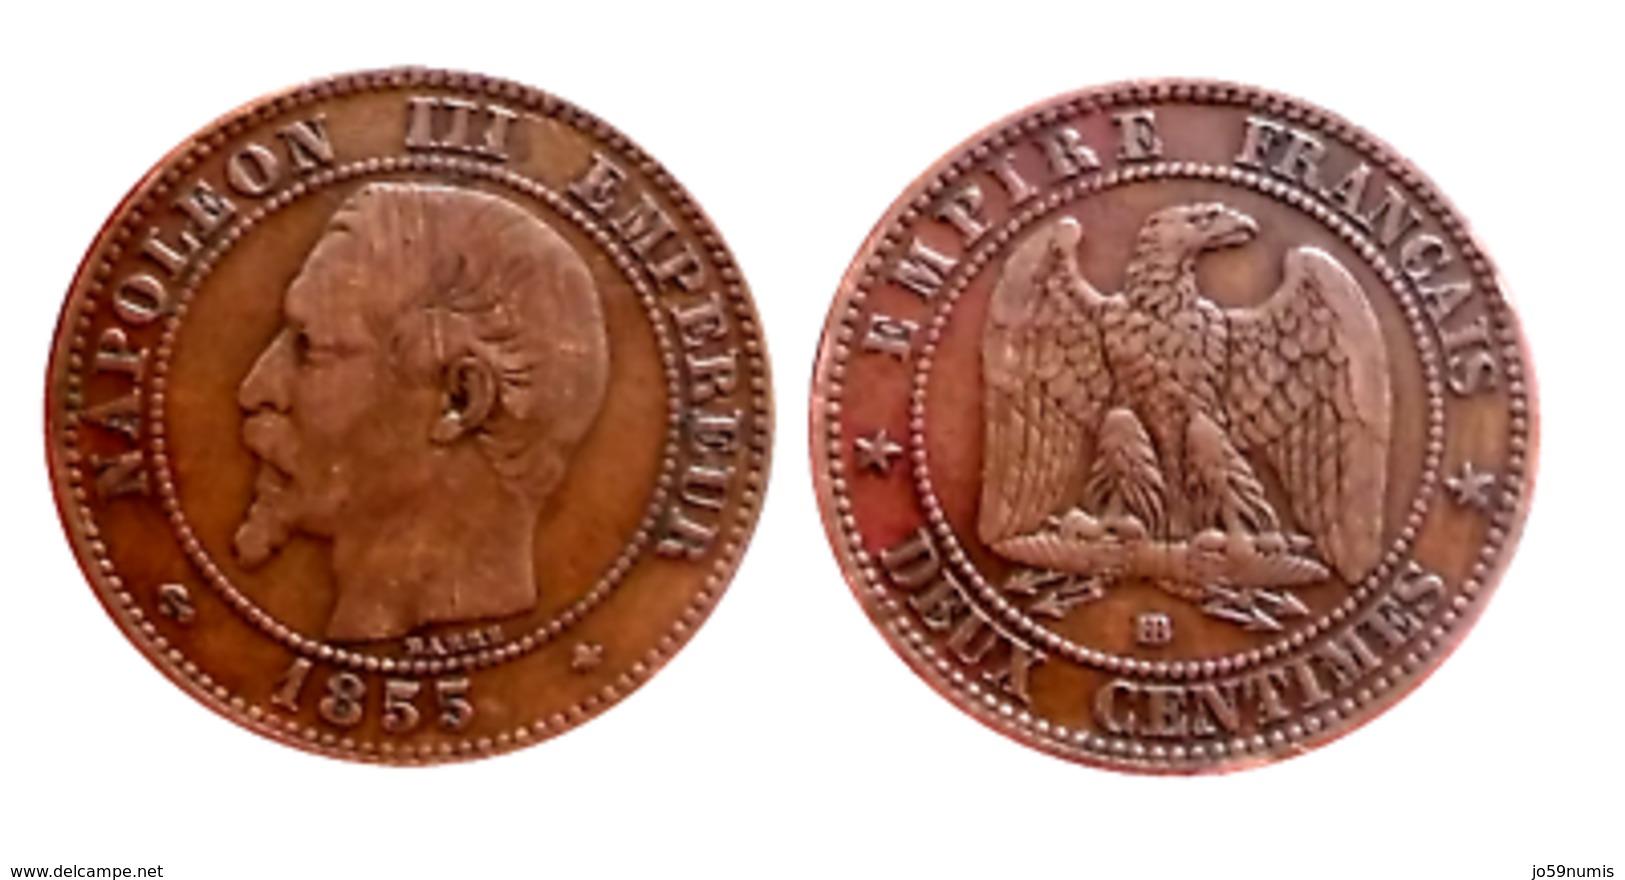 RARE!!! NAPOLÉON III 2 Centimes 1855 BB (Strasbourg) ANCRE A VOIR!!! - B. 2 Centimes